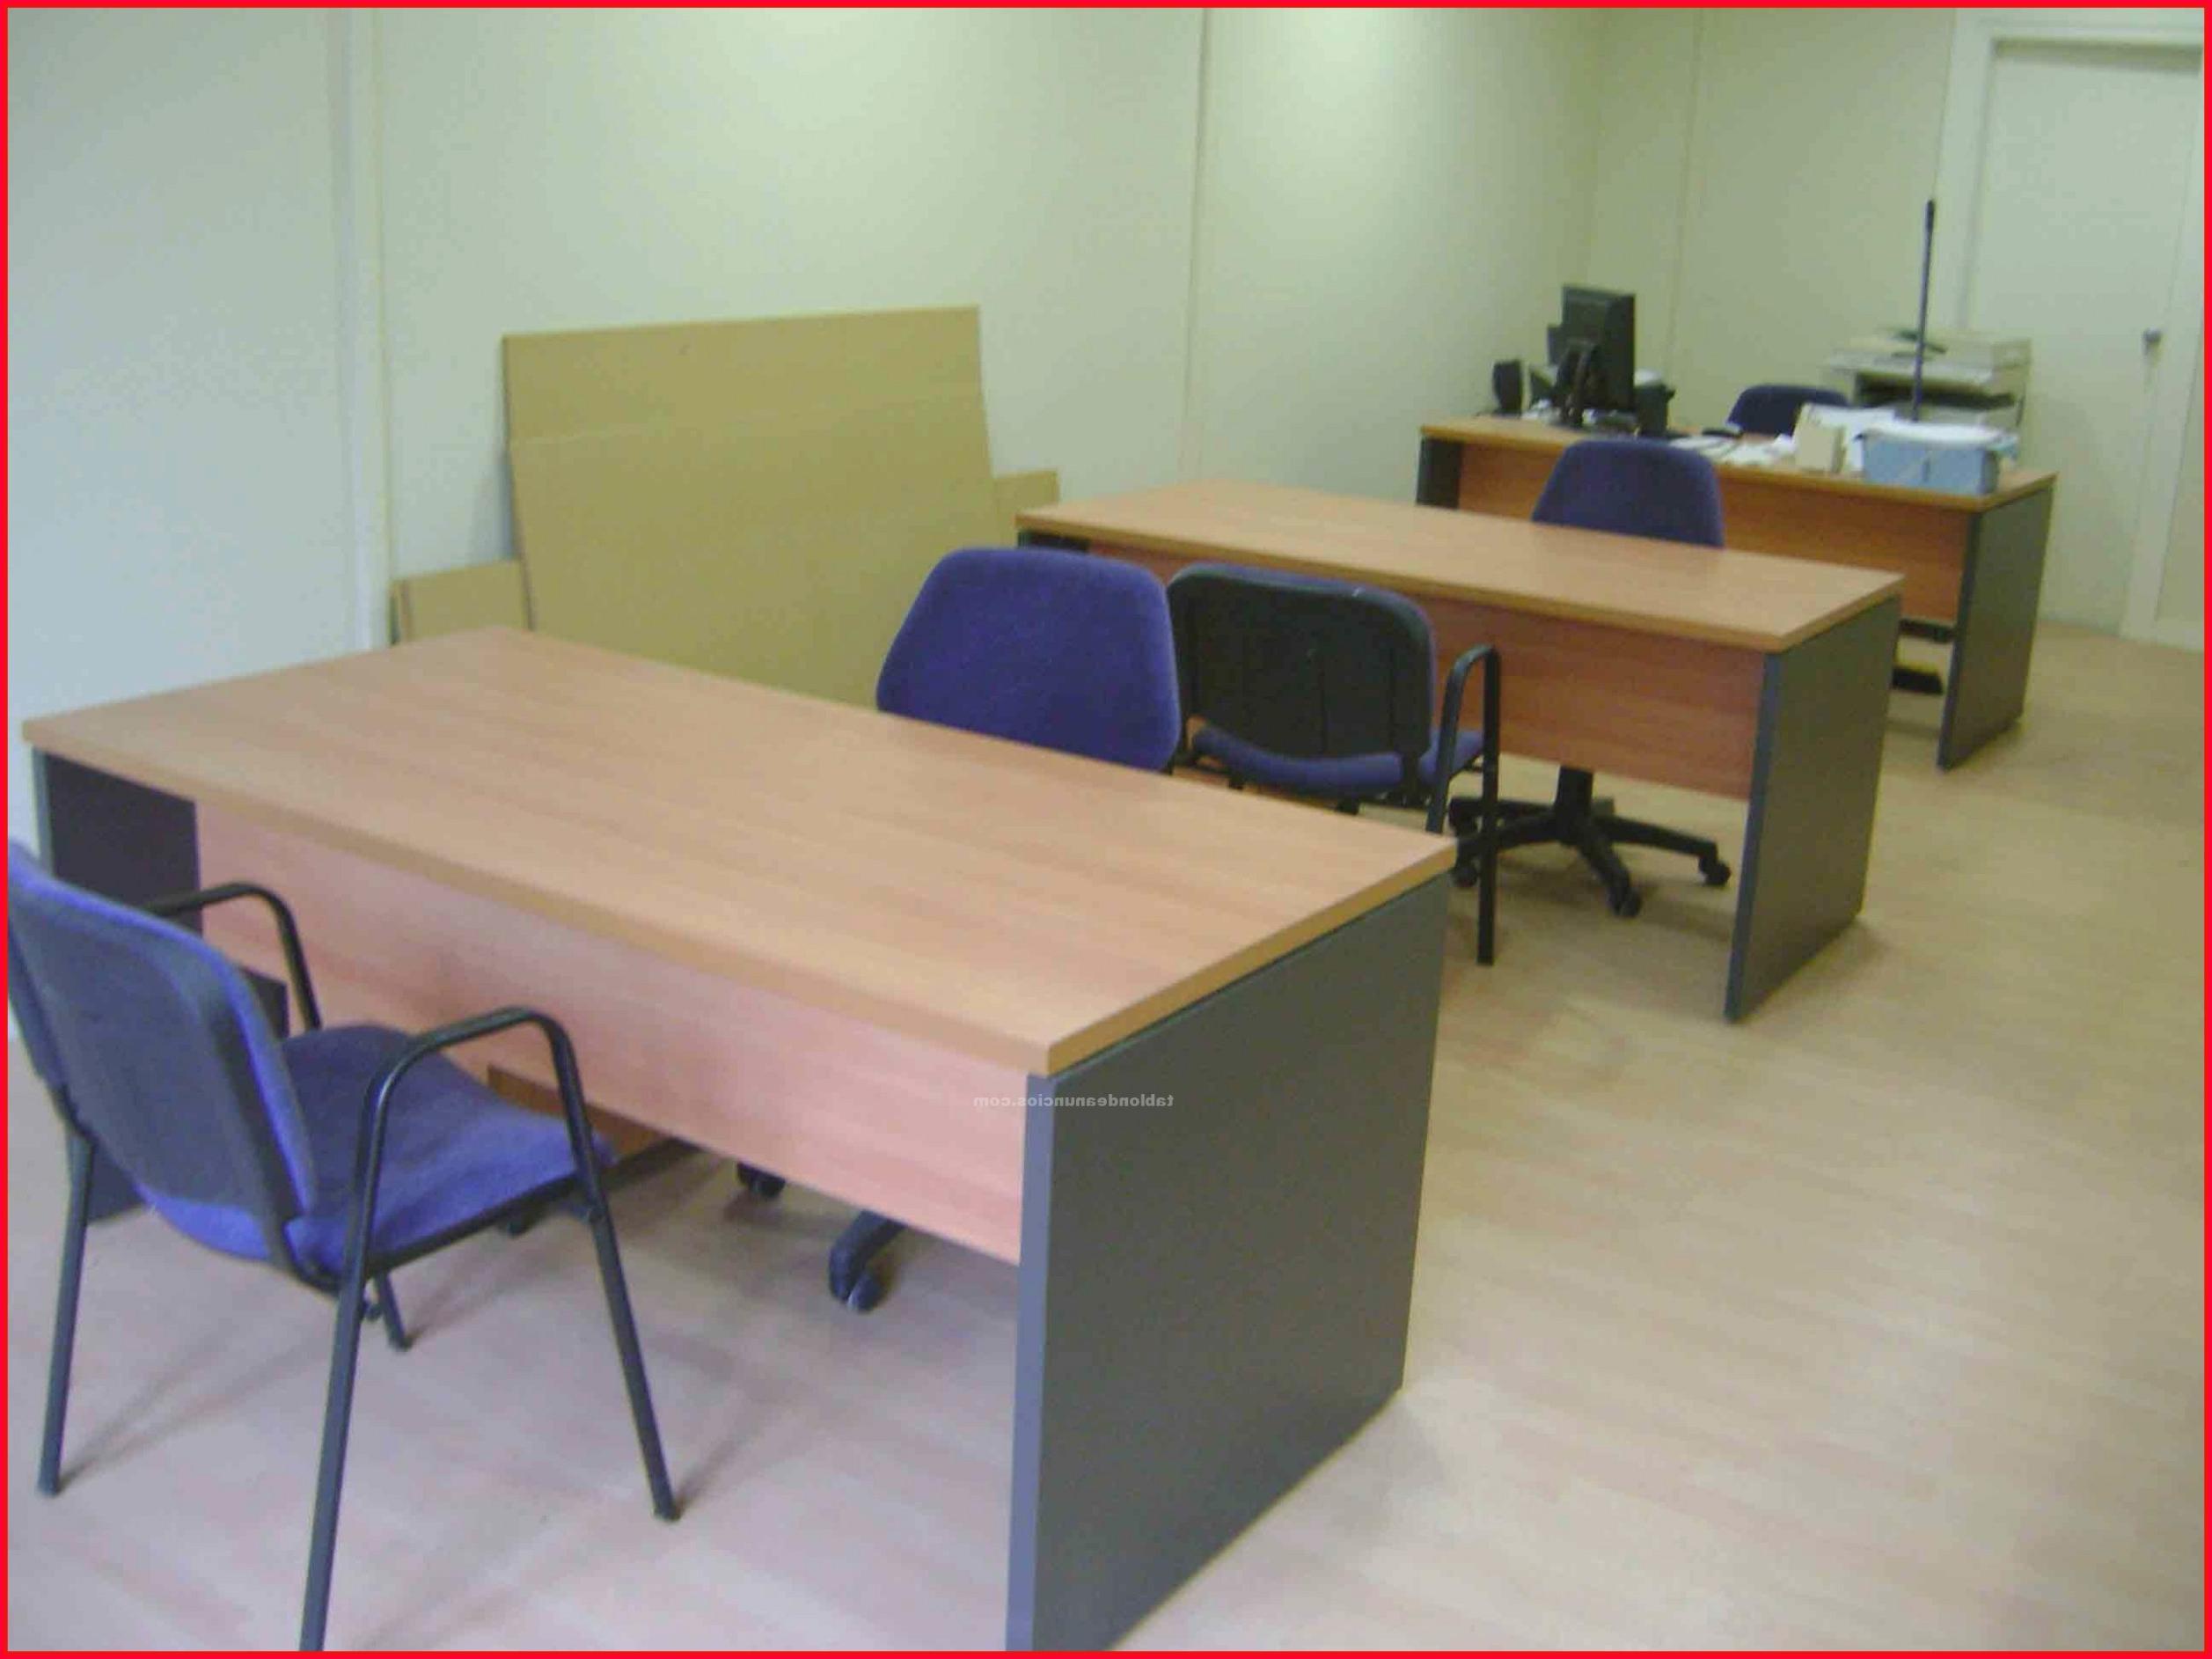 Muebles Oficina Segunda Mano Madrid Xtd6 Muebles Oficina Segunda Mano Madrid Muebles Icina Segunda